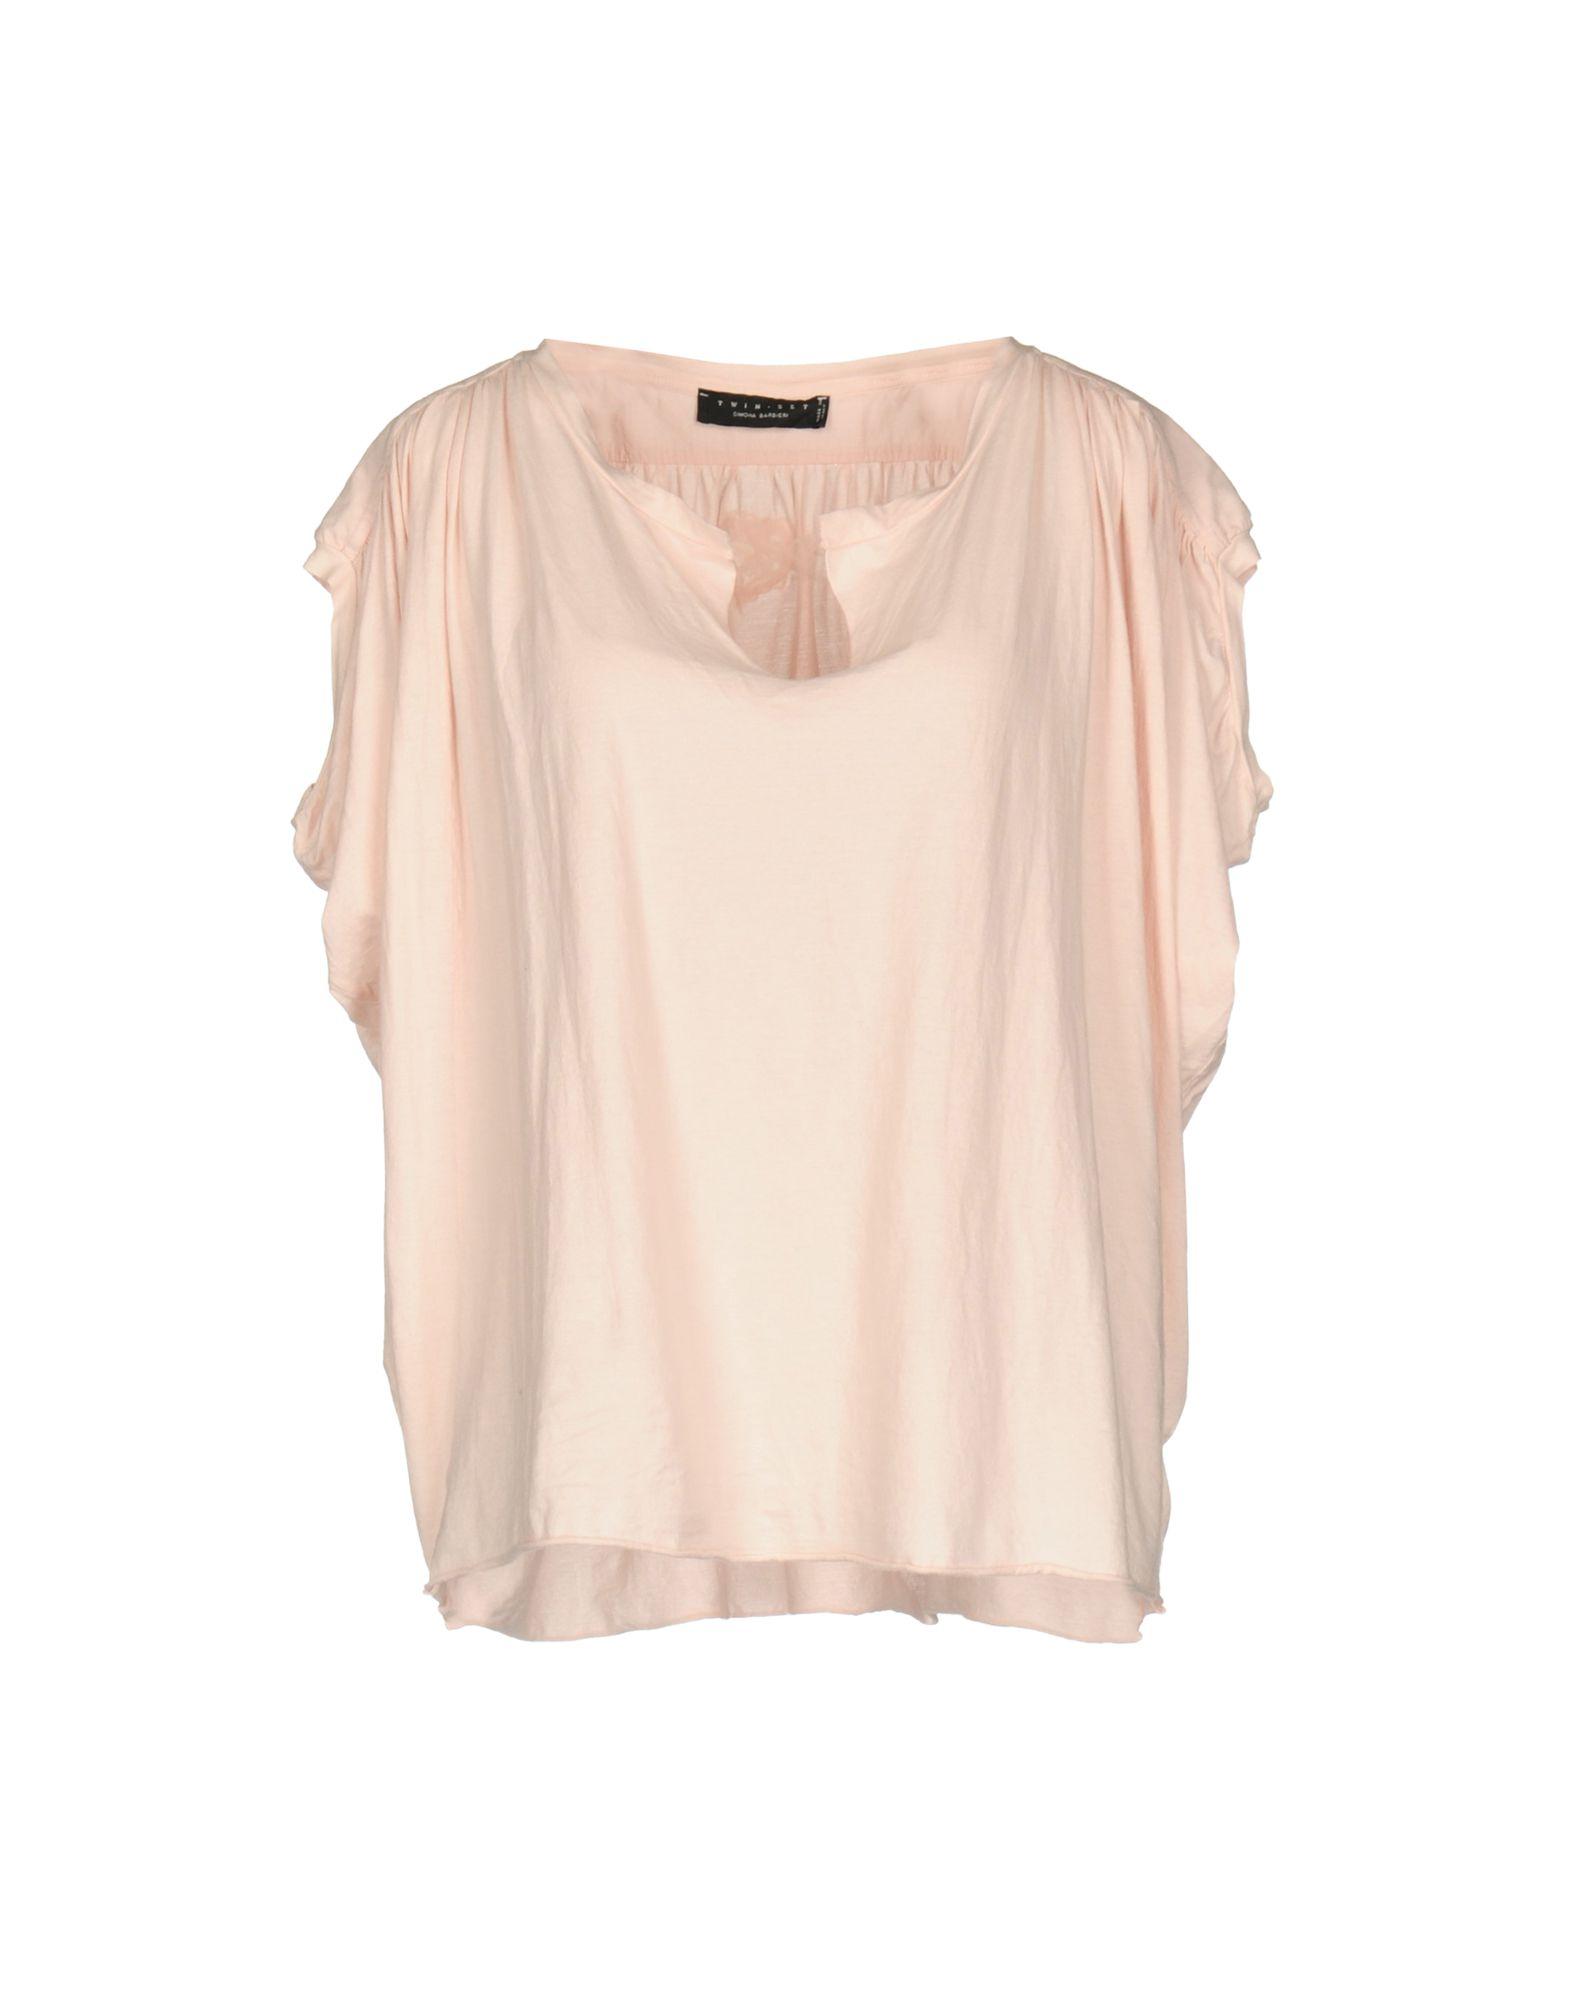 TWIN-SET Simona Barbieri Damen T-shirts Farbe Rosa Größe 4 jetztbilligerkaufen